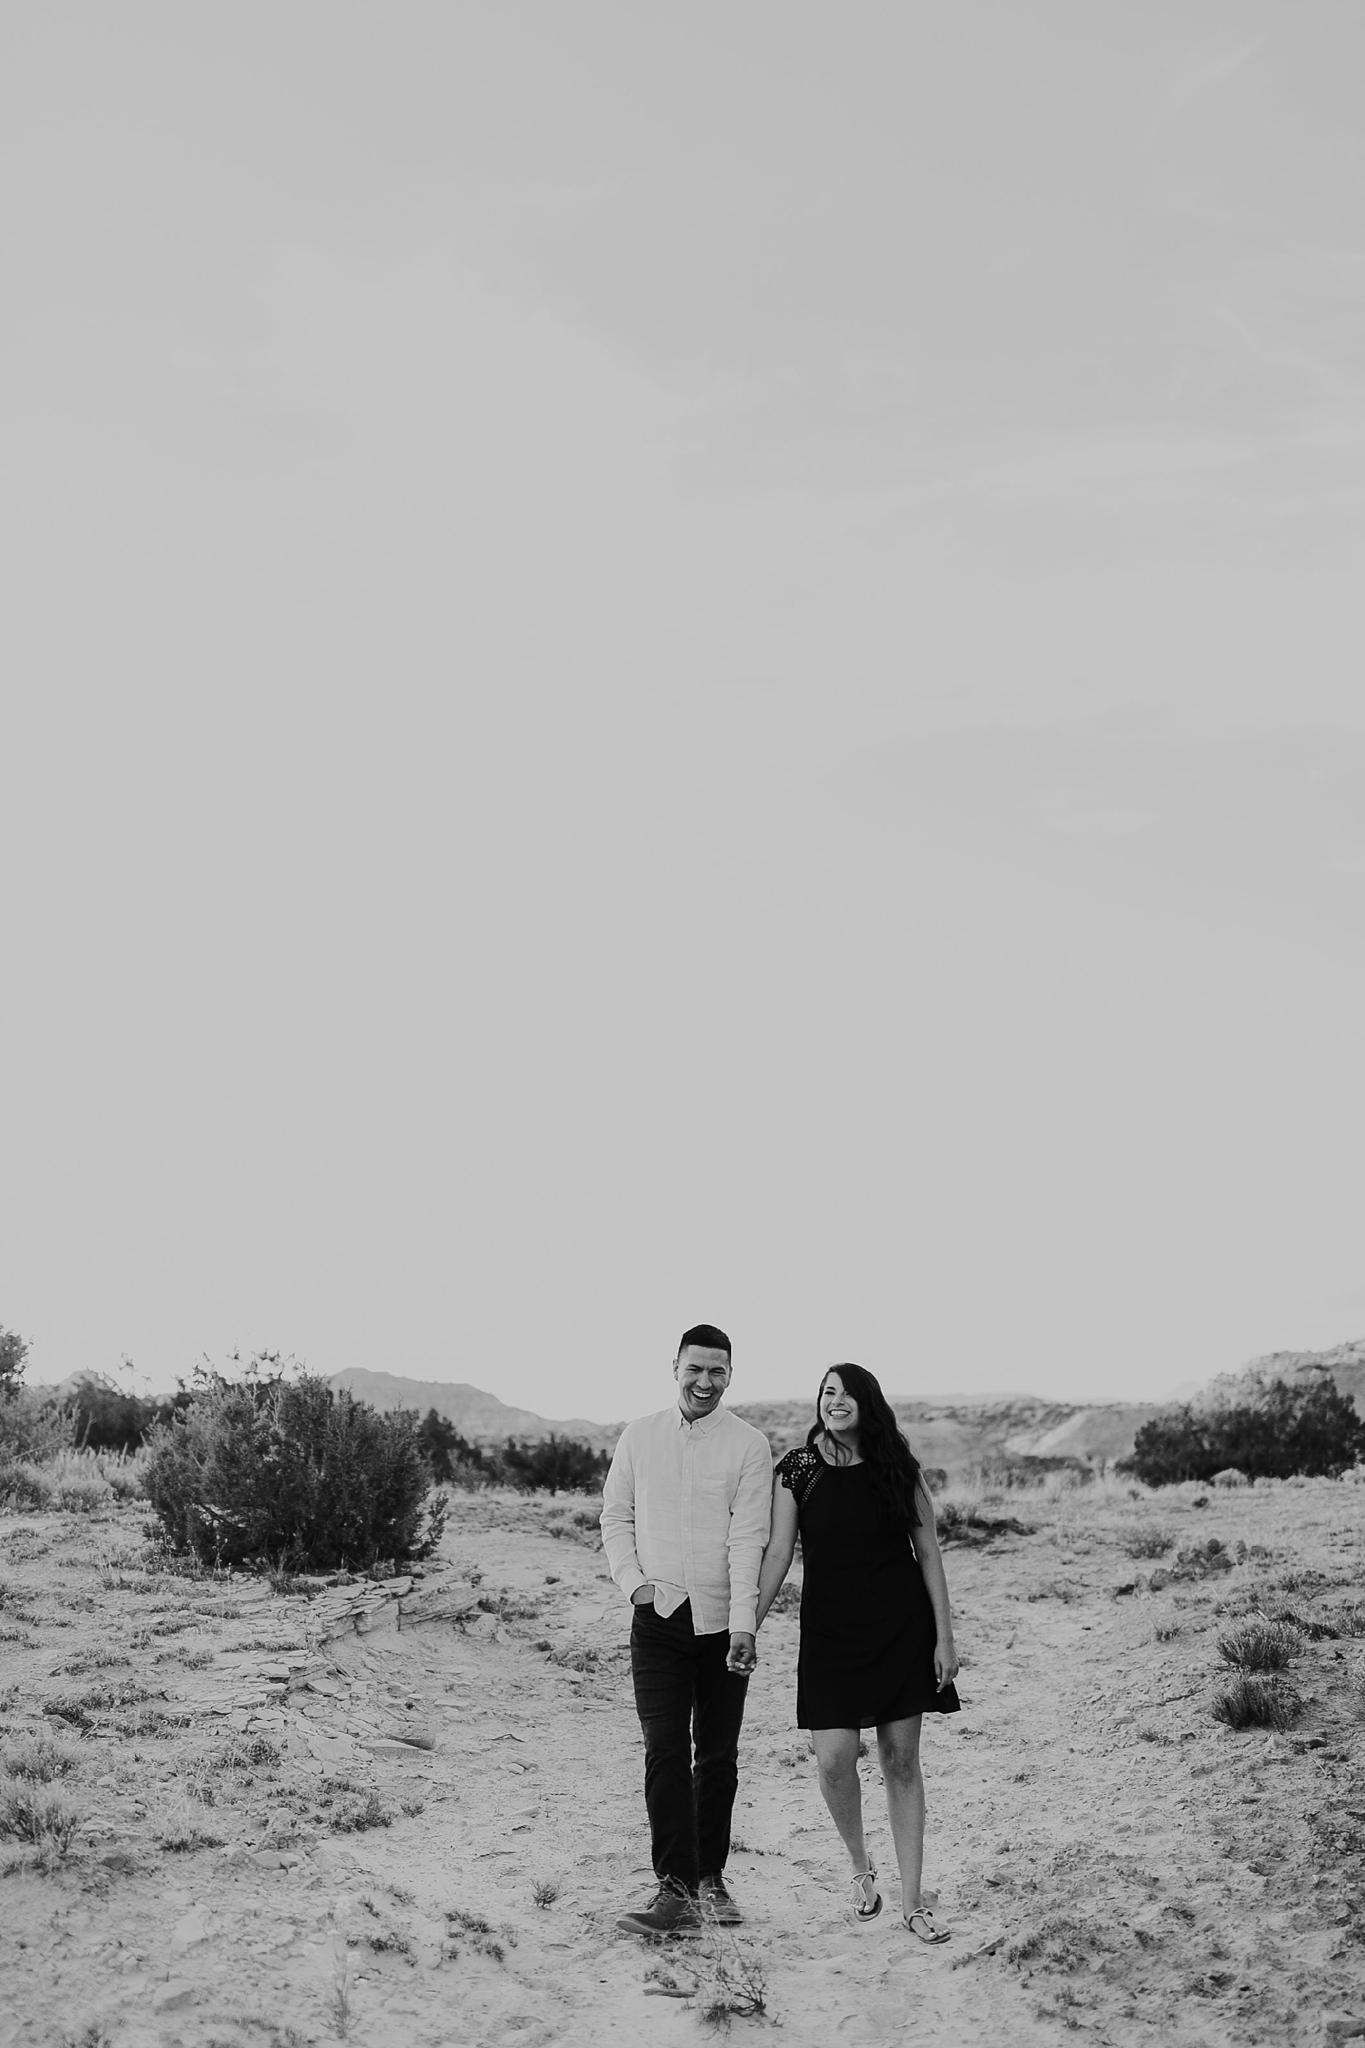 Alicia+lucia+photography+-+albuquerque+wedding+photographer+-+santa+fe+wedding+photography+-+new+mexico+wedding+photographer+-+new+mexico+wedding+-+new+mexico+engagement+-+white+mesa+engagement+-+desert+engagement_0016.jpg